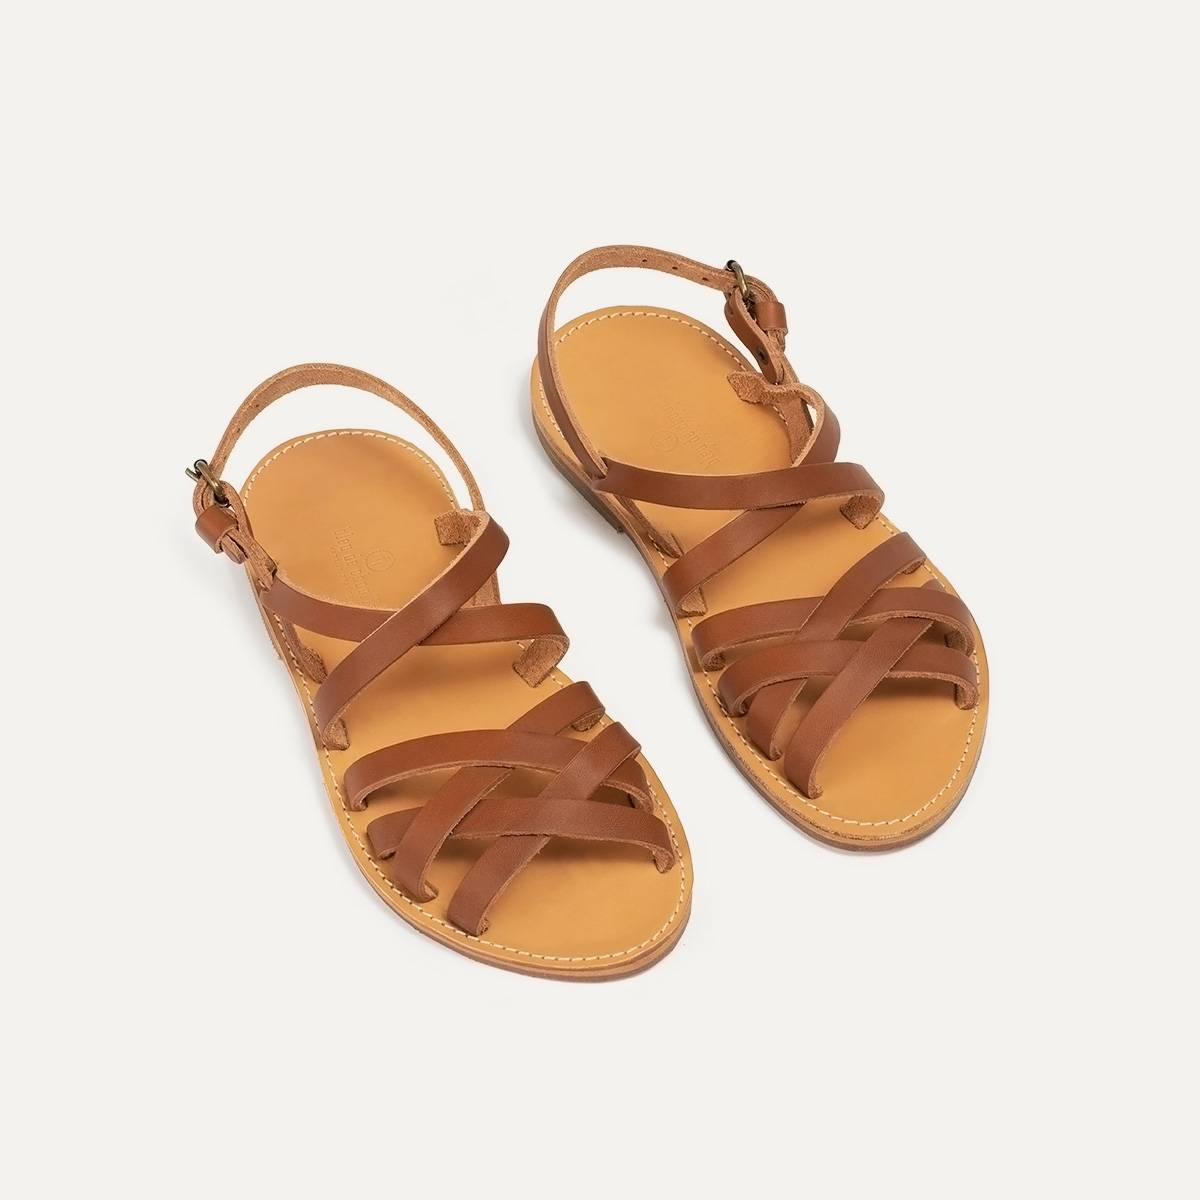 Sandales cuir Majour - Pain Brûlé (image n°3)